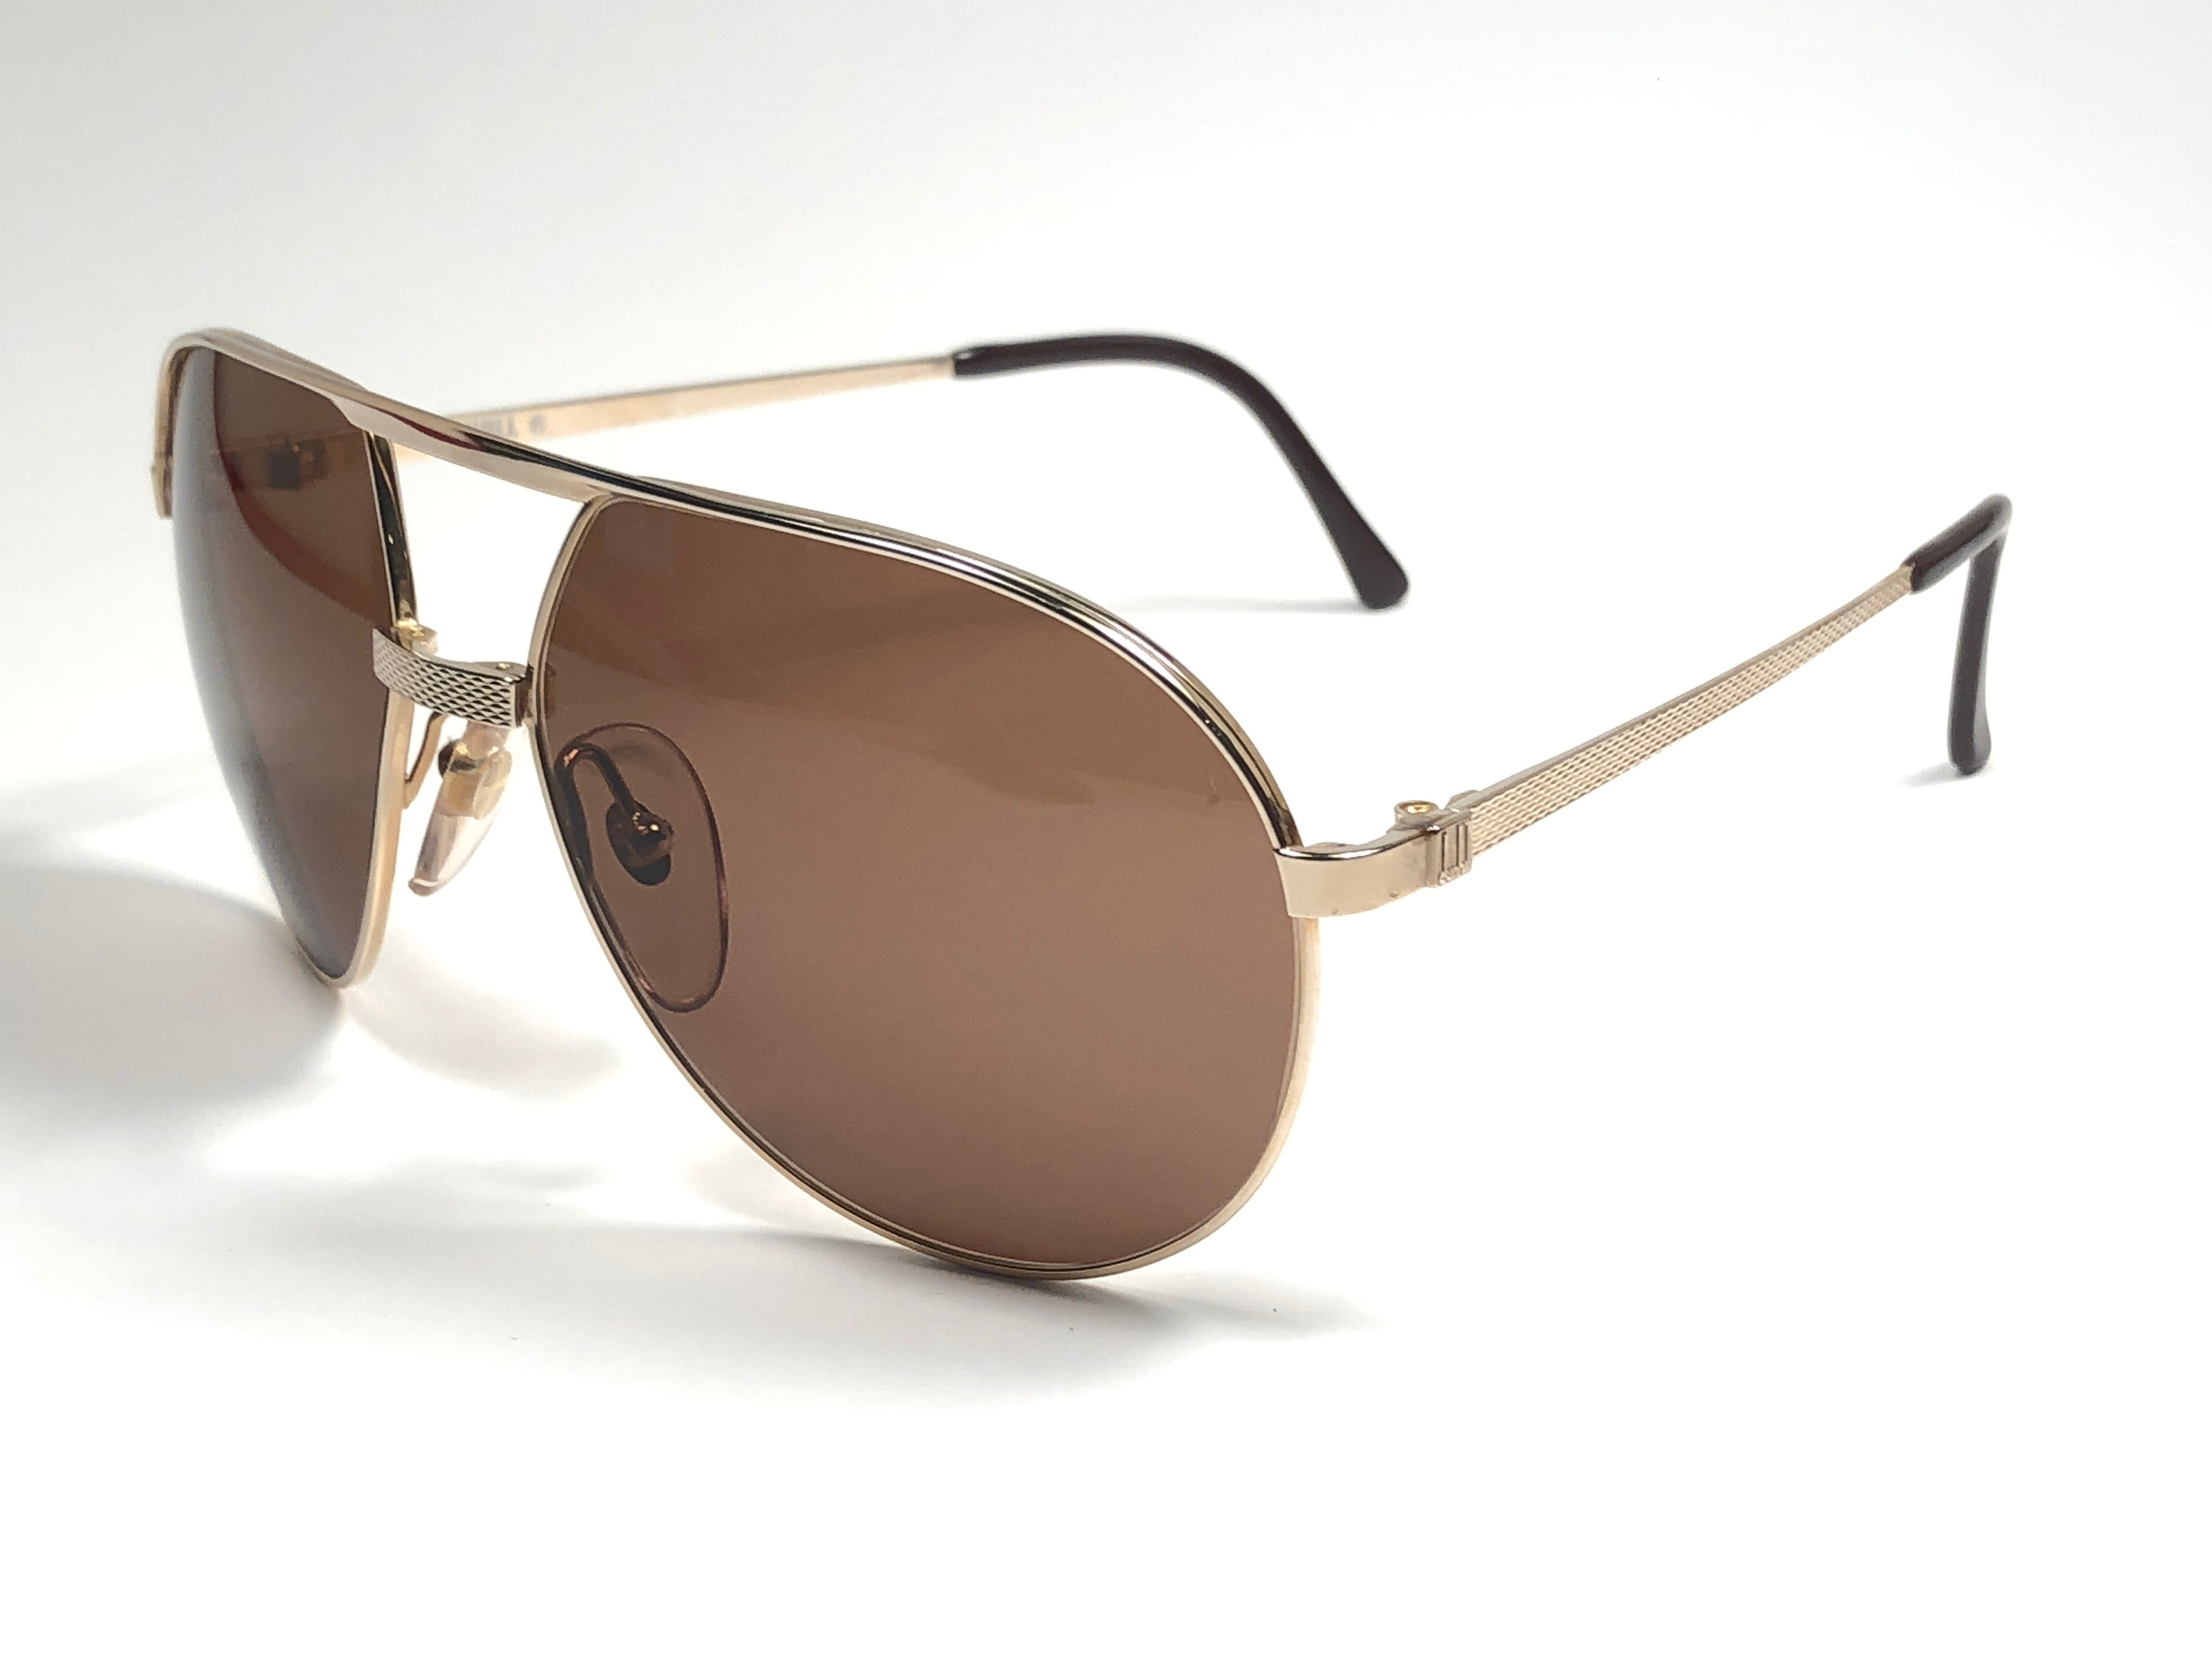 1c159f05cd New Vintage Dunhill 6042 Gold Frame Aviator Brown Lenses Sunglasses France  For Sale at 1stdibs